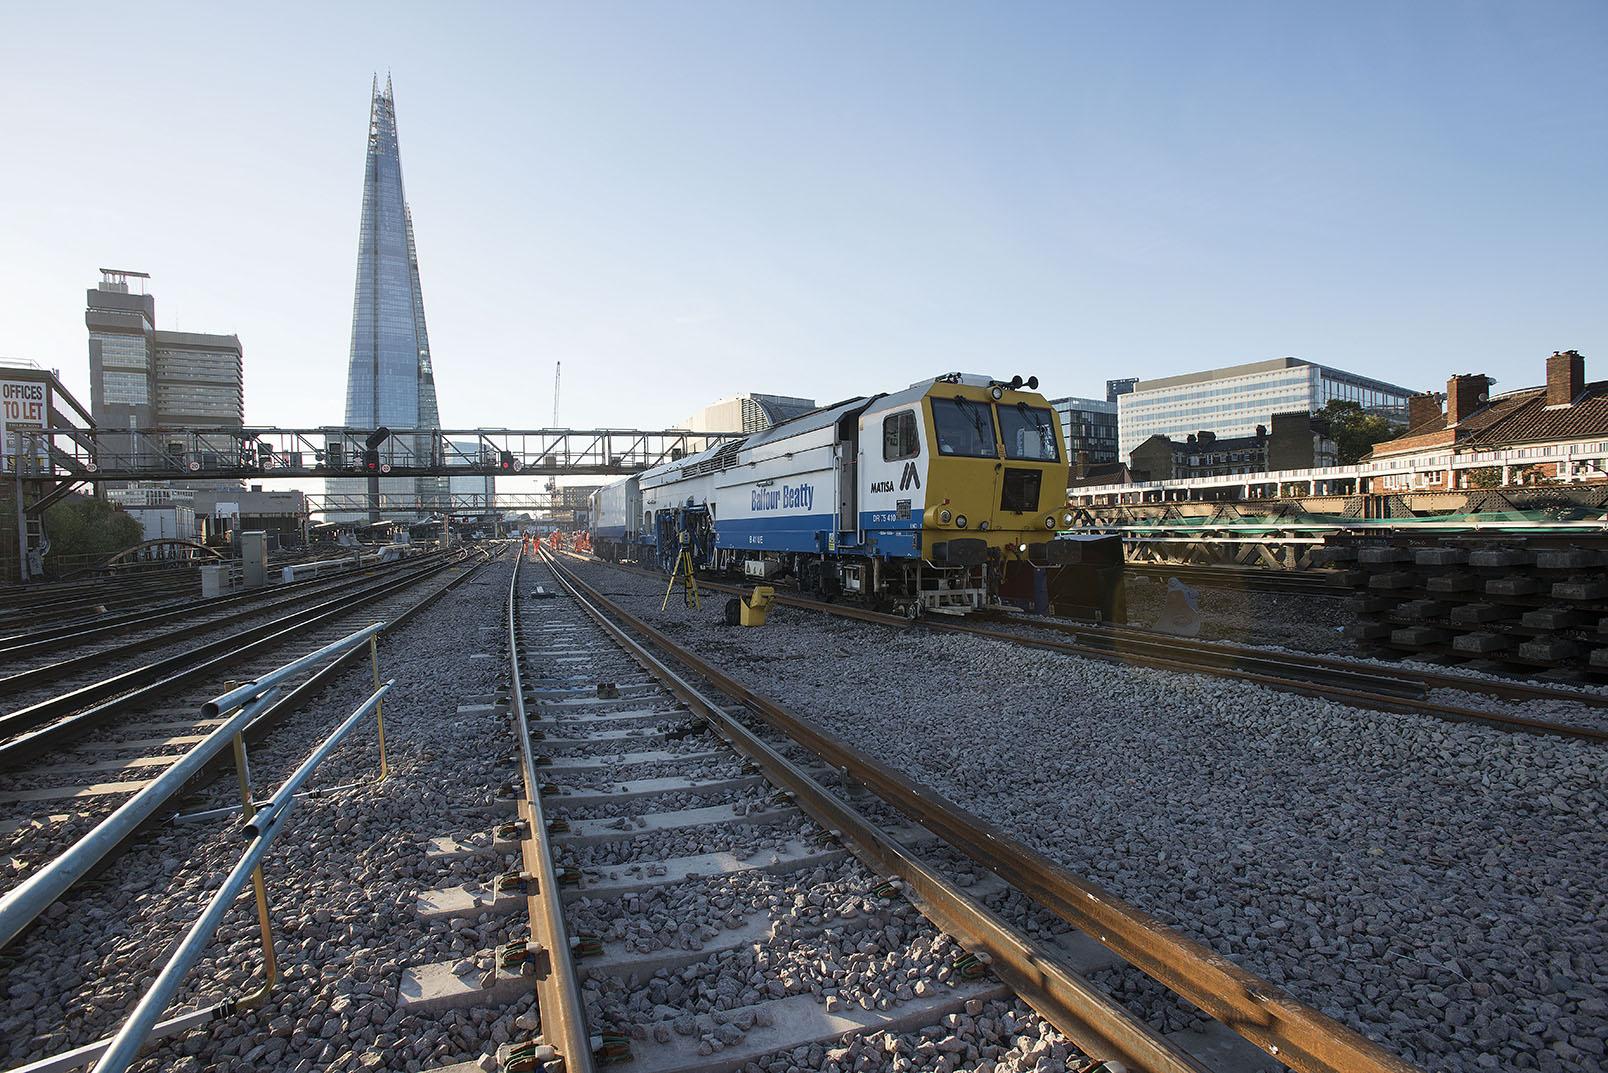 British railways track laying by night